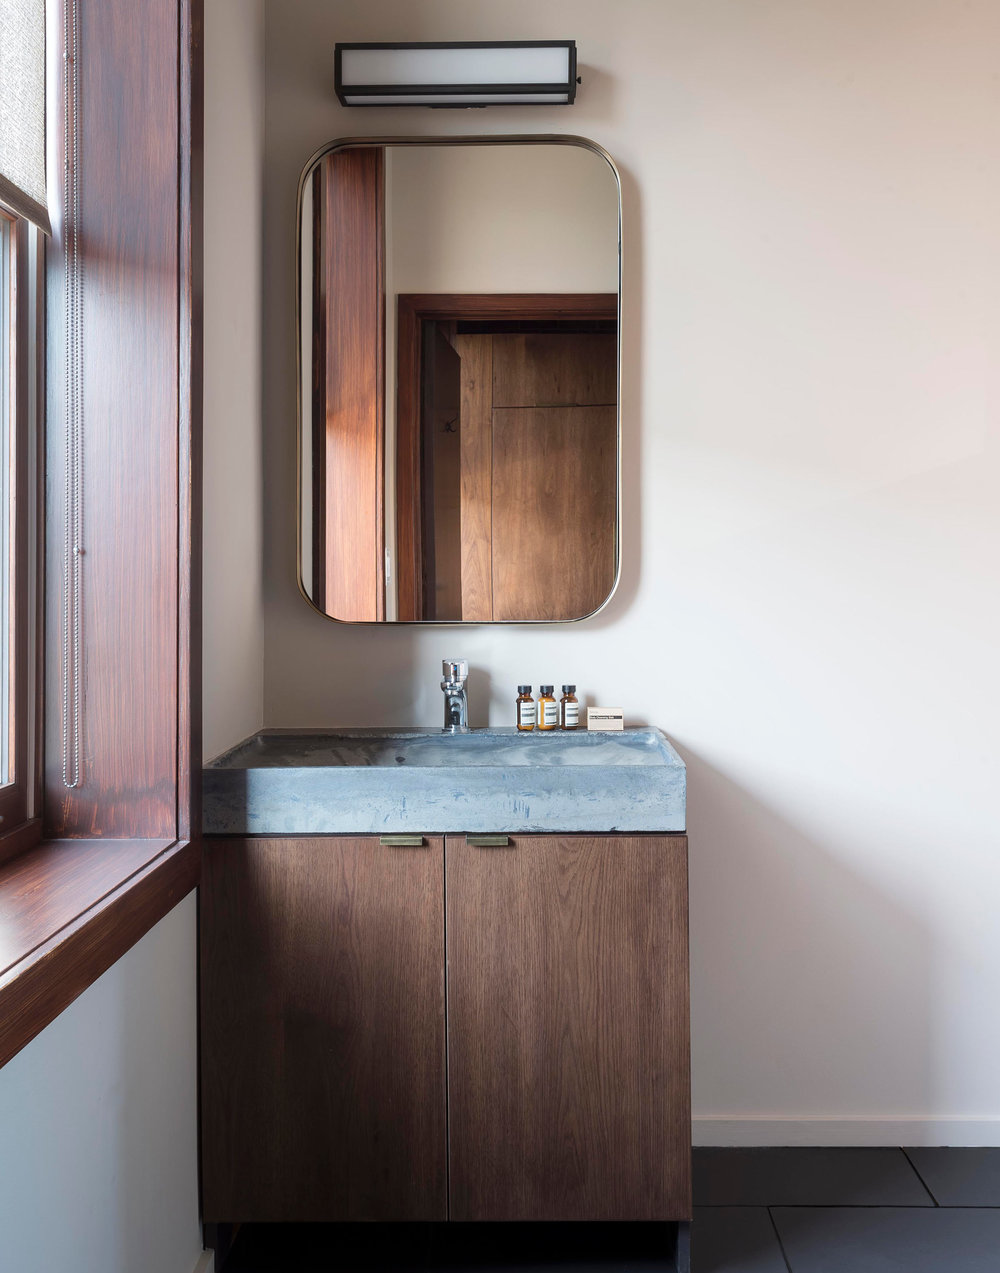 Wm.-Mulherin_s-Sons-Hotel---Bathroom-vanity---by-Matthew-Williams.jpg